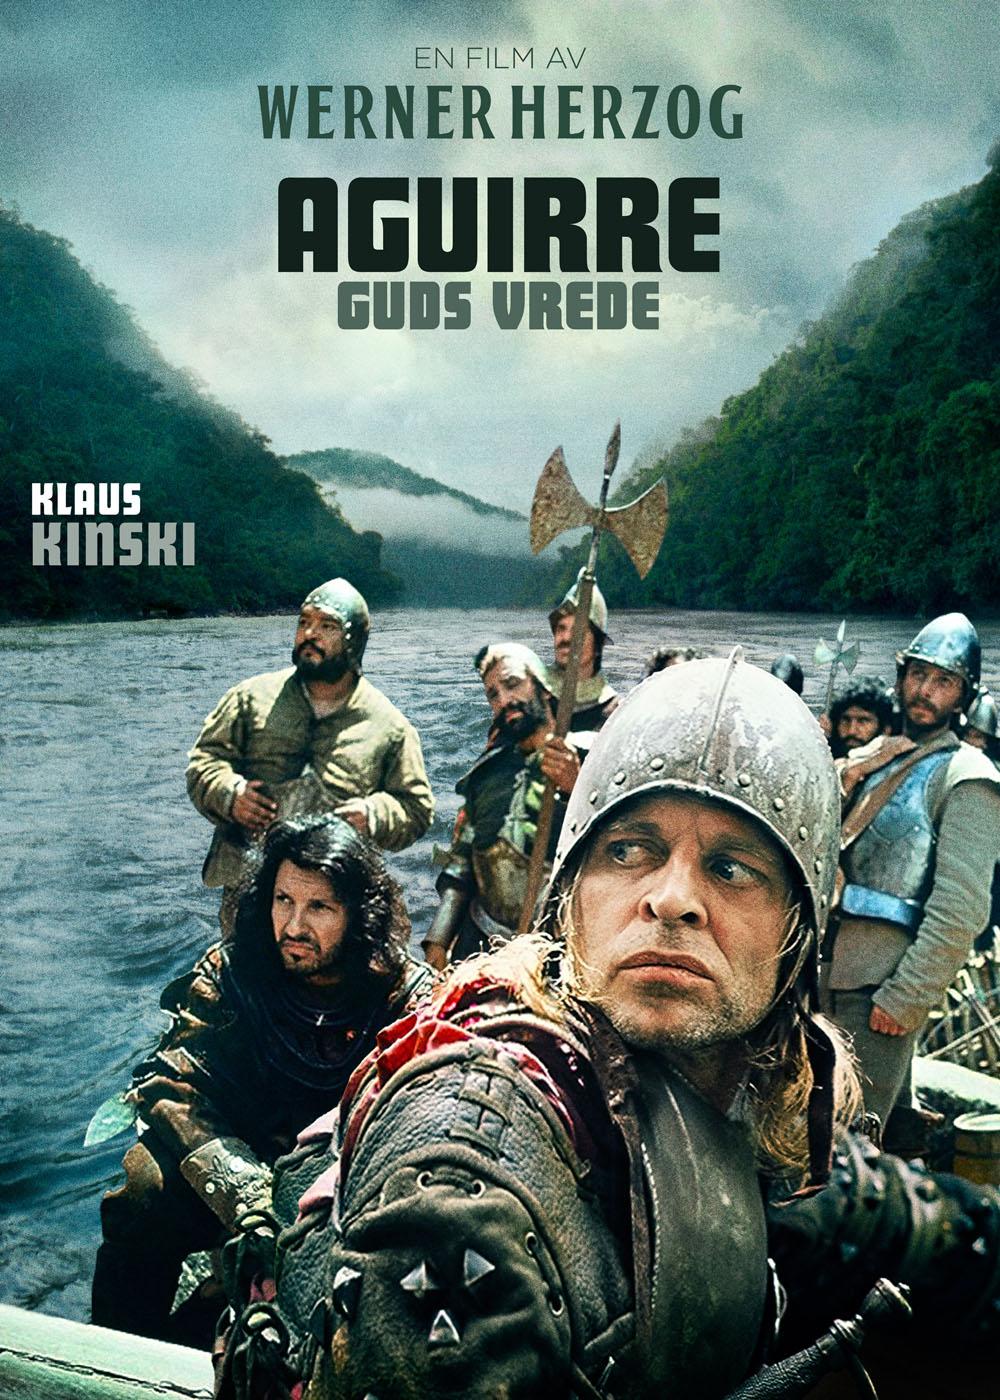 Aguirre-poster.jpg